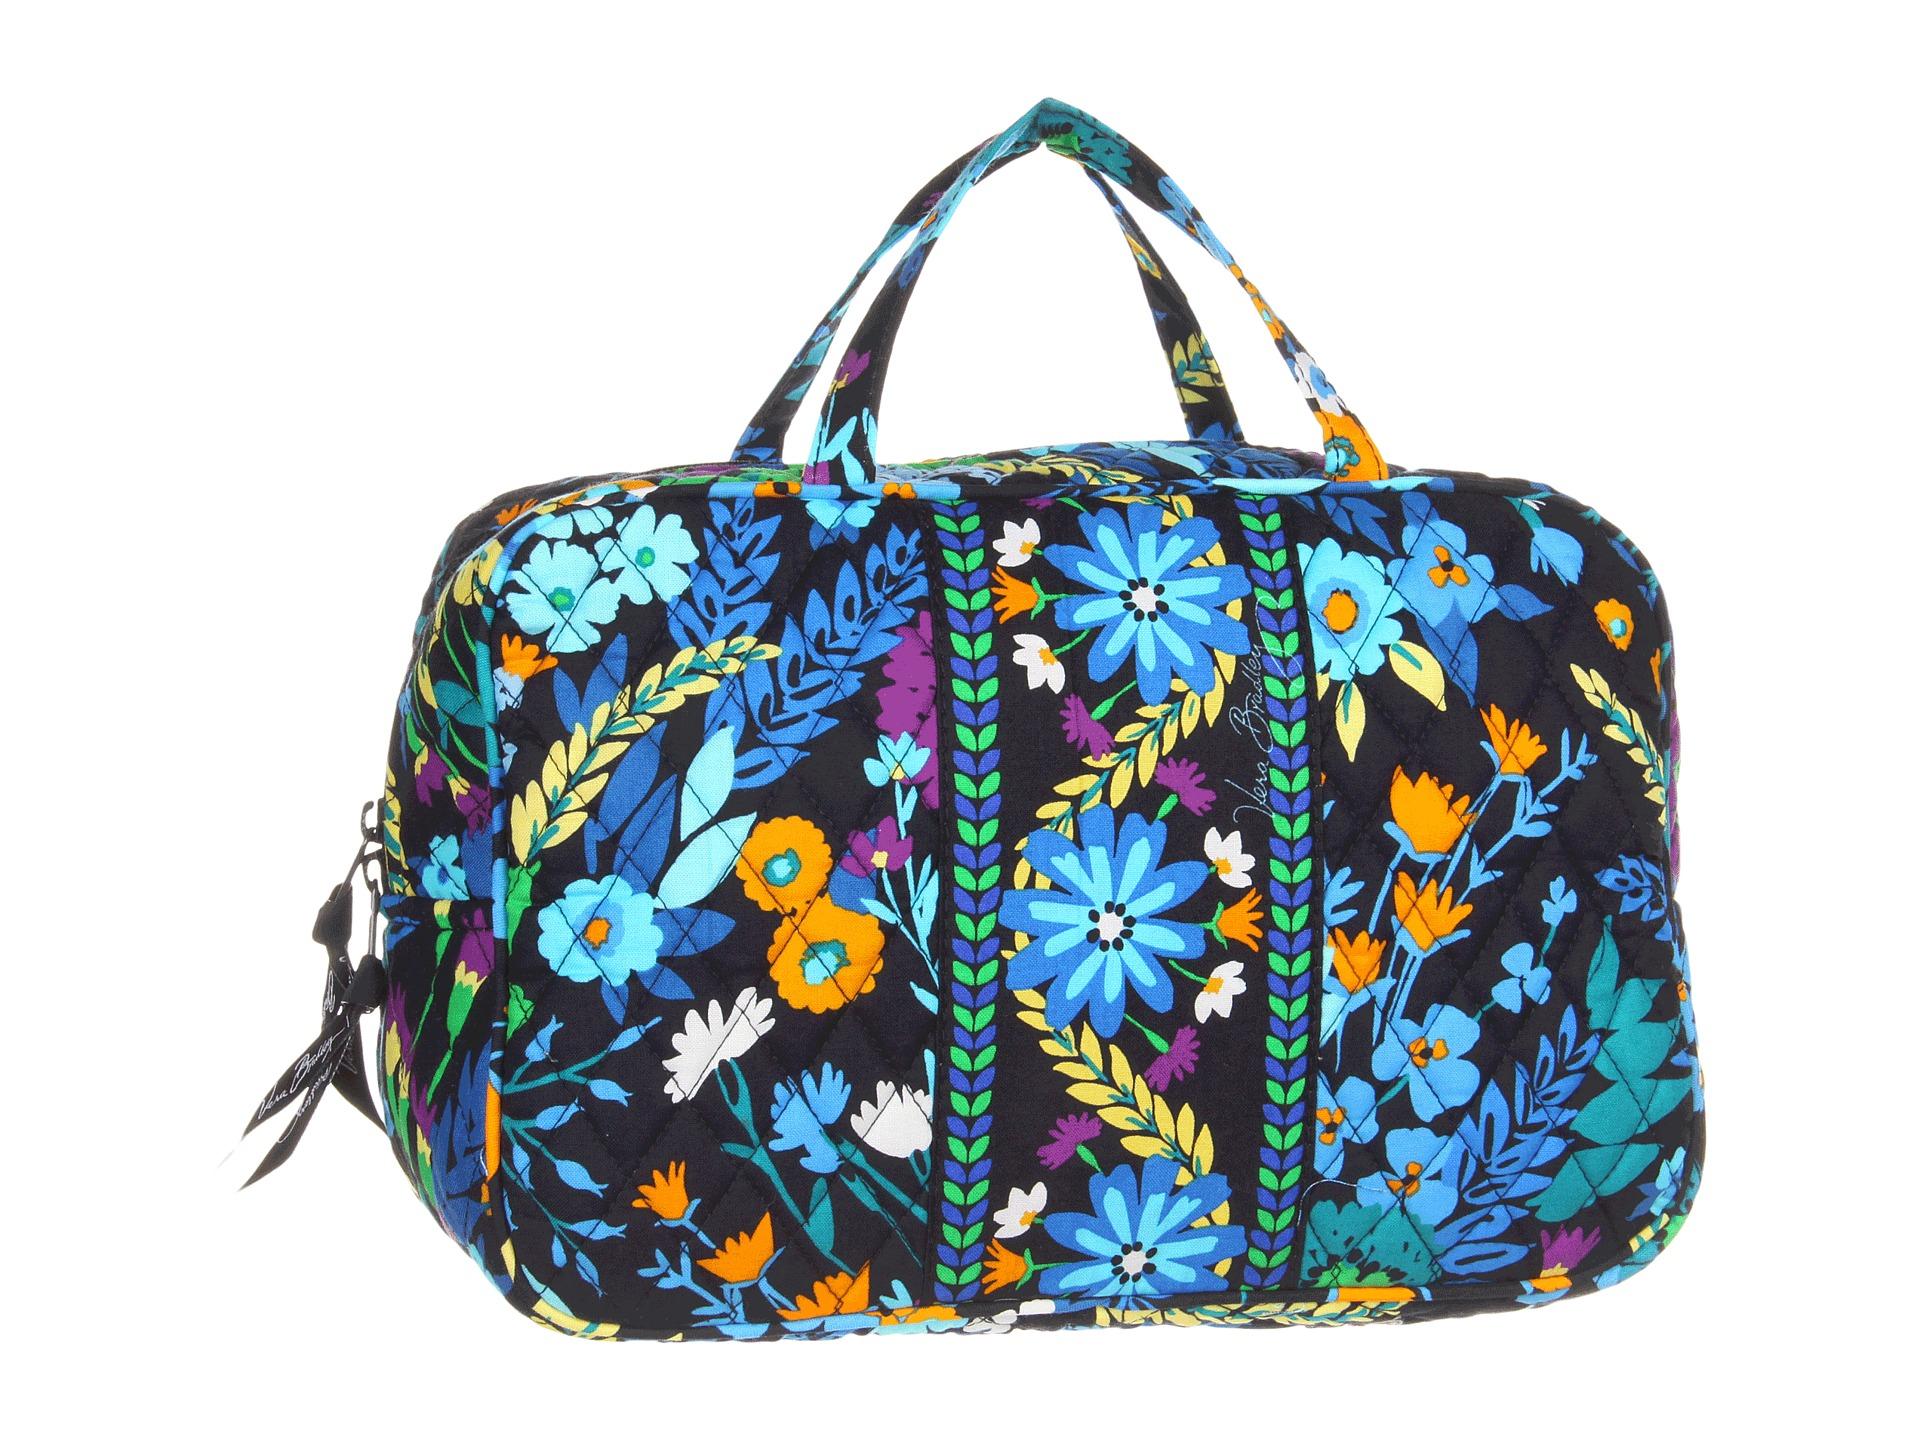 small handbags vera bradley grand cosmetic bag